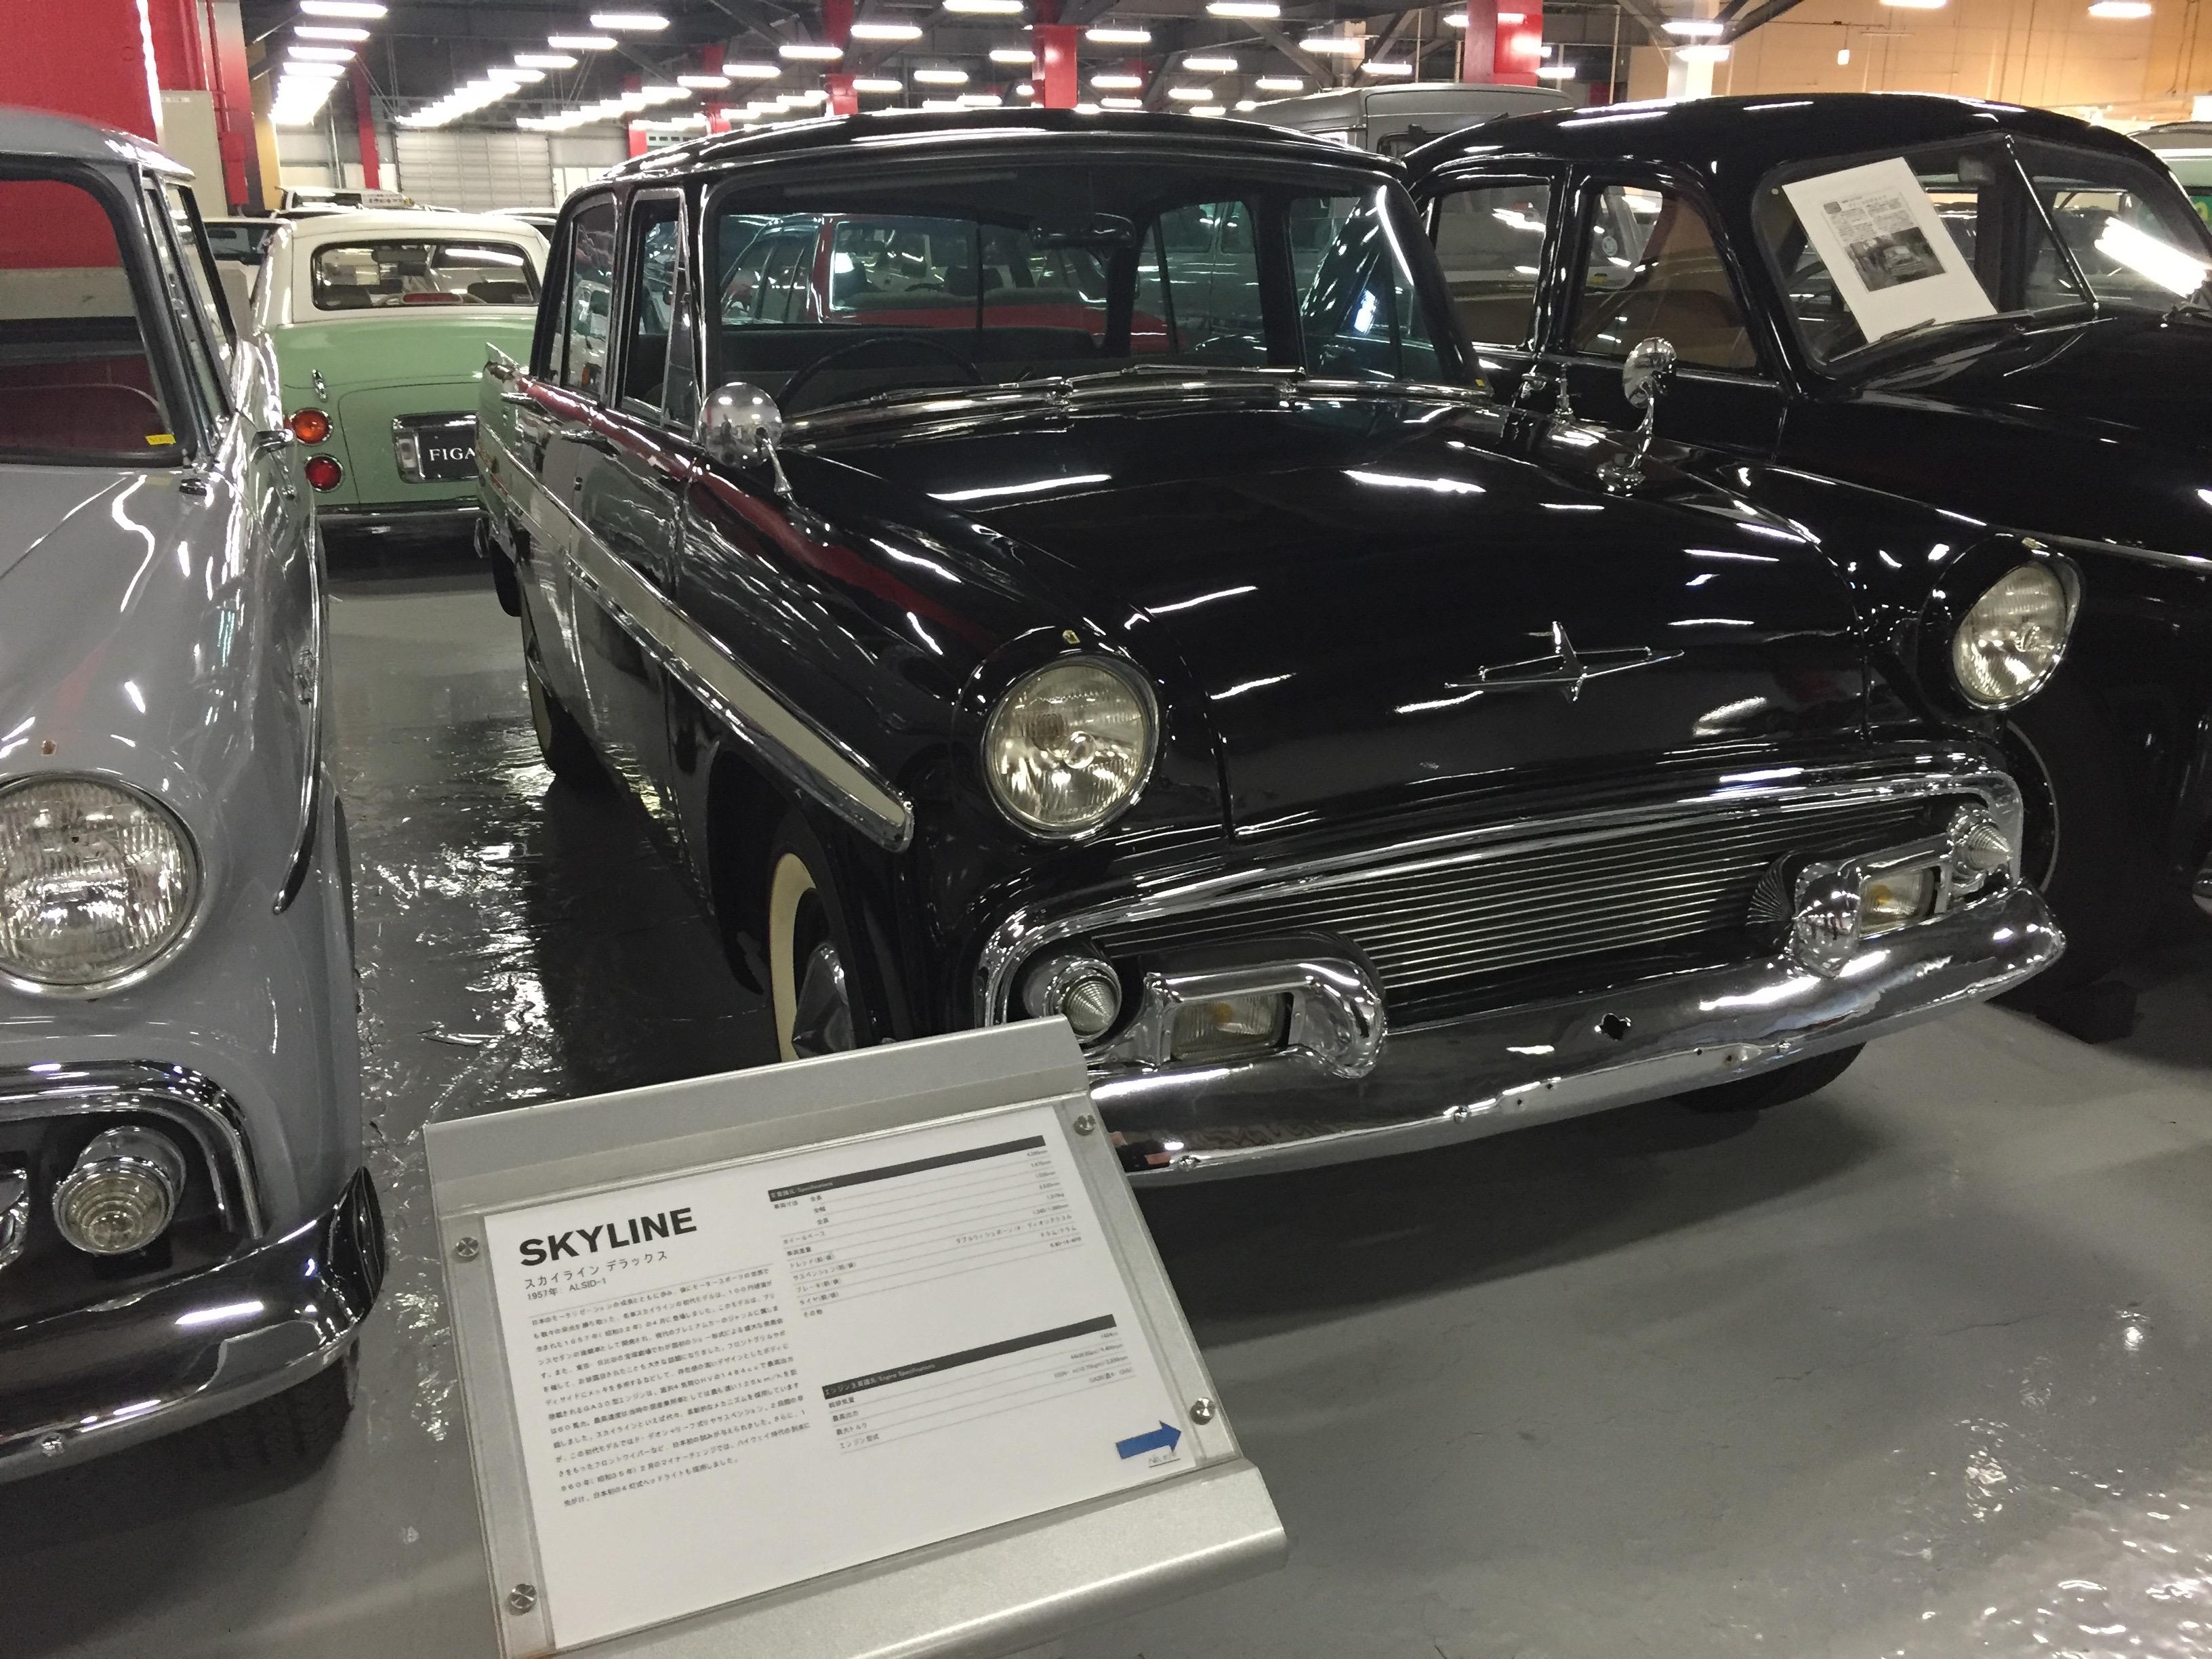 1957 Prince Skyline Deluxe